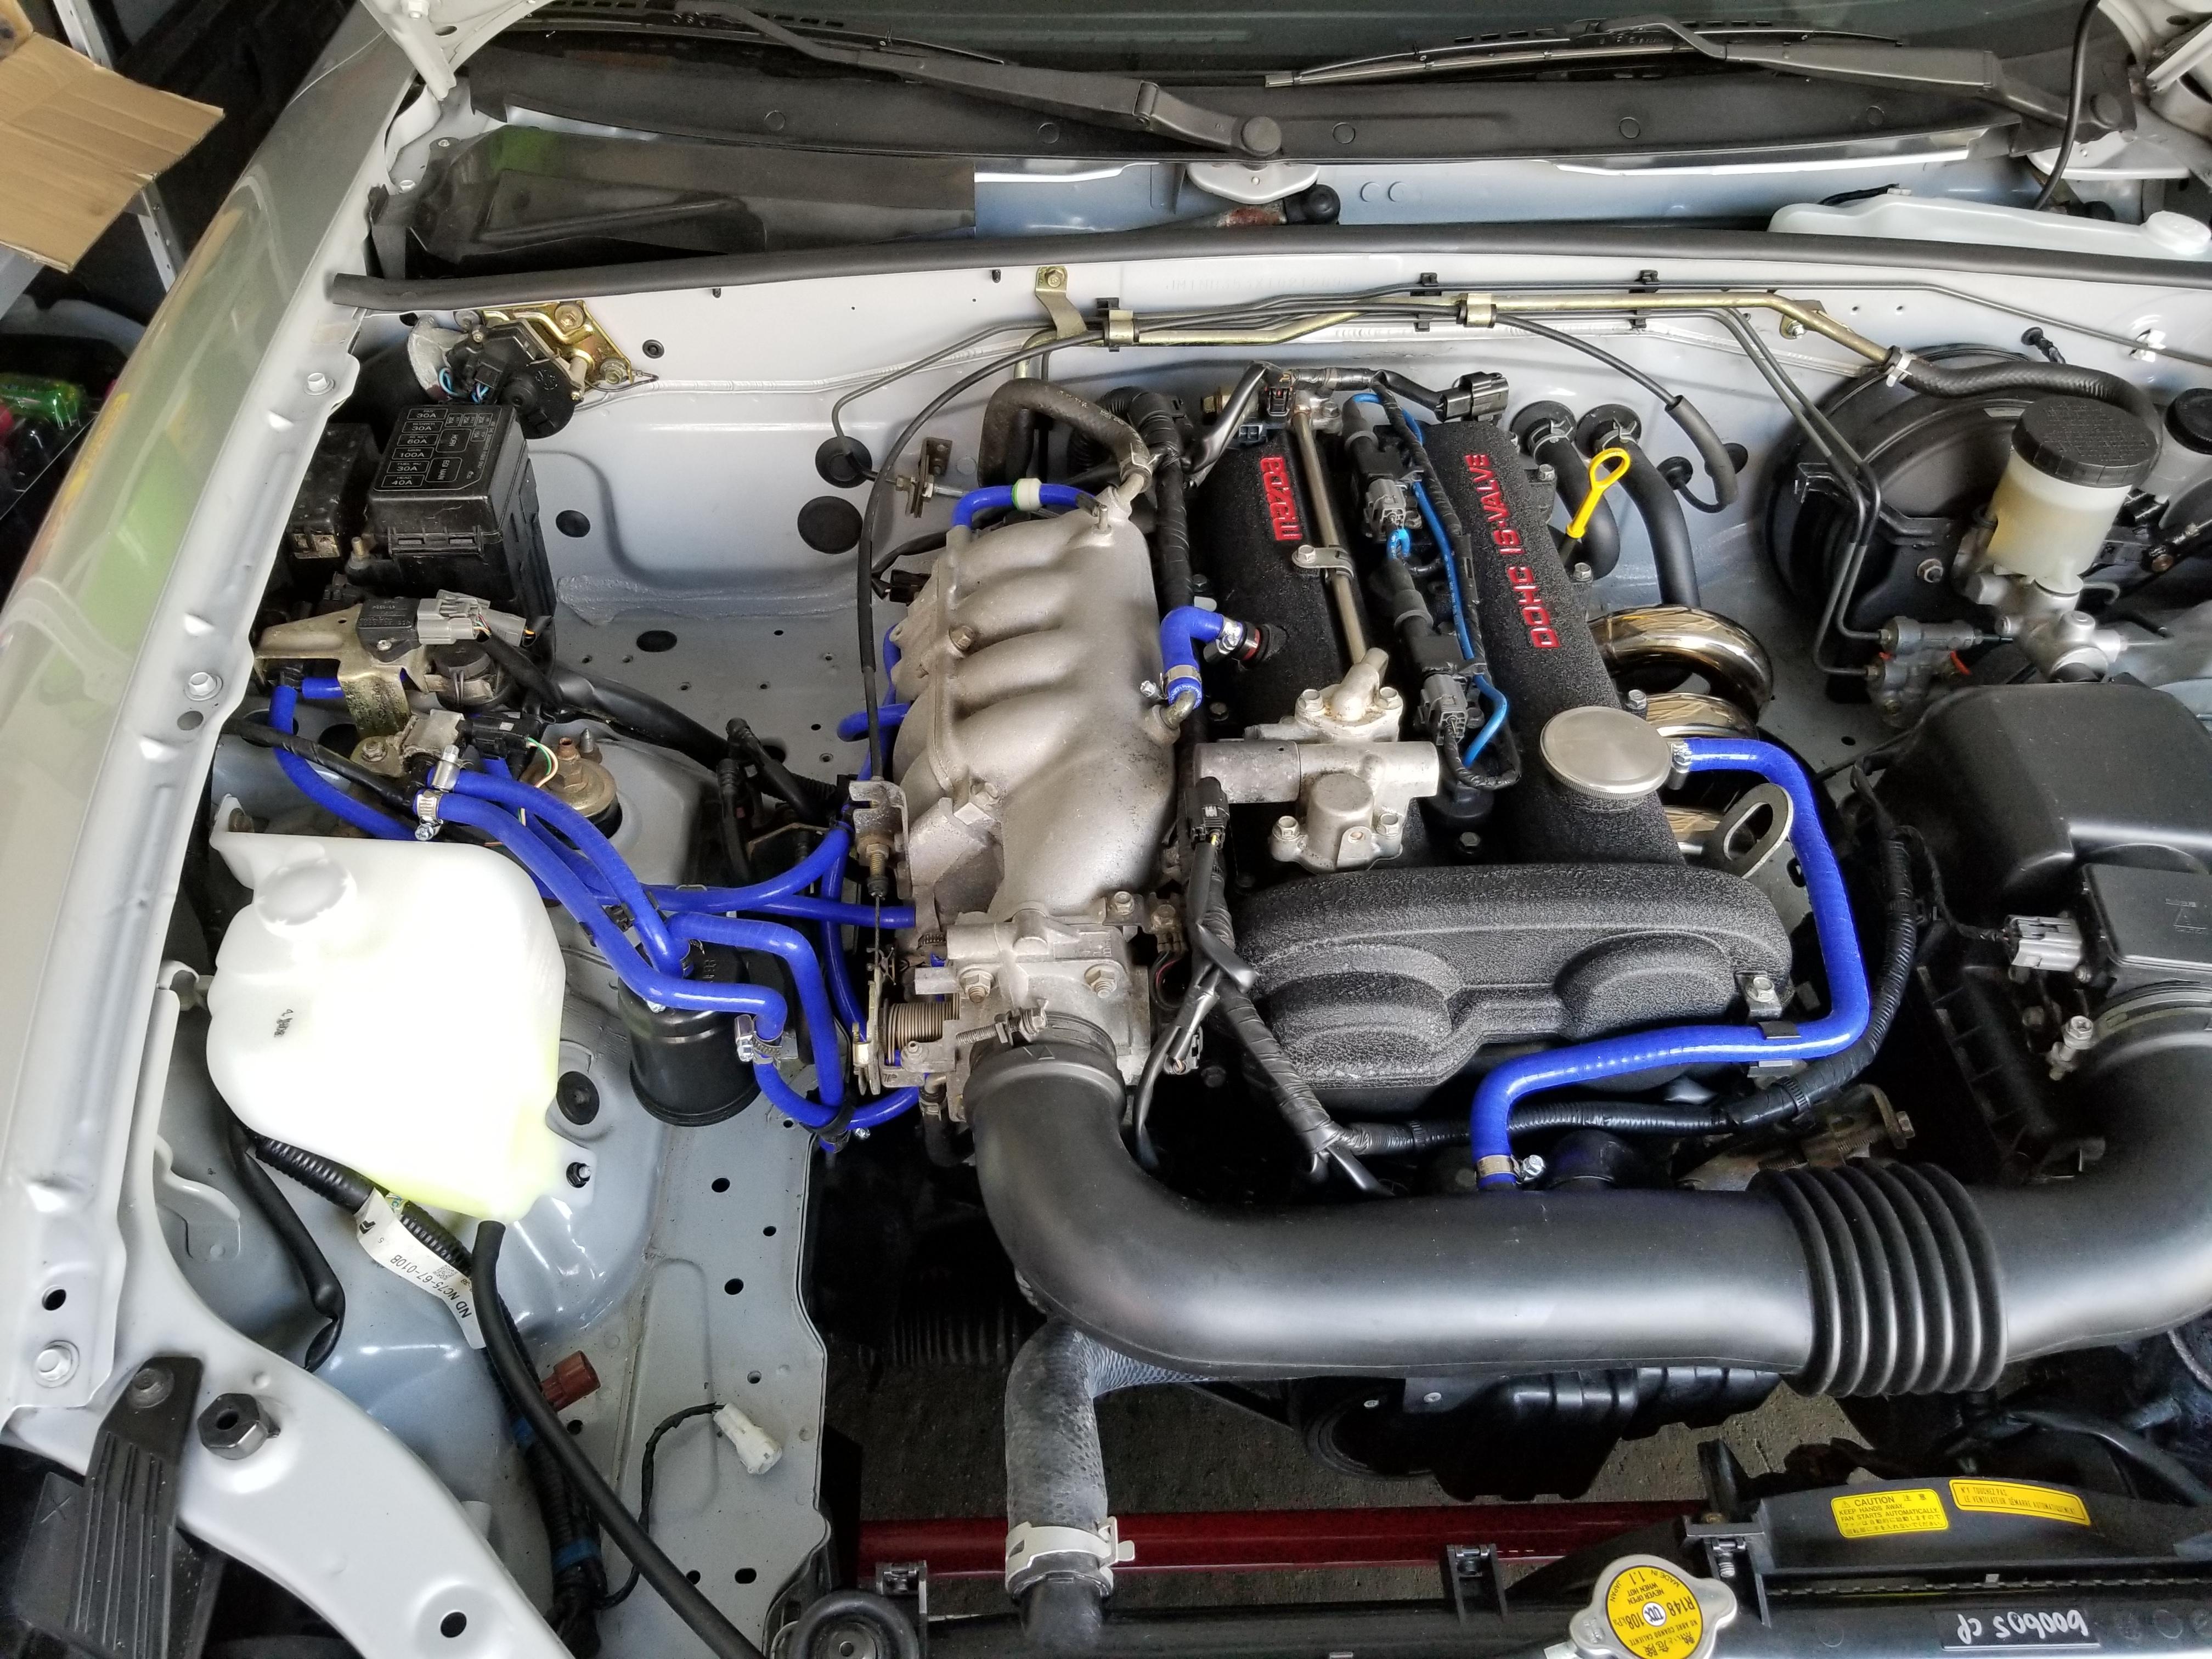 Mazda Mx 5 Vacuum Diagram - Wiring Diagrams Outlet